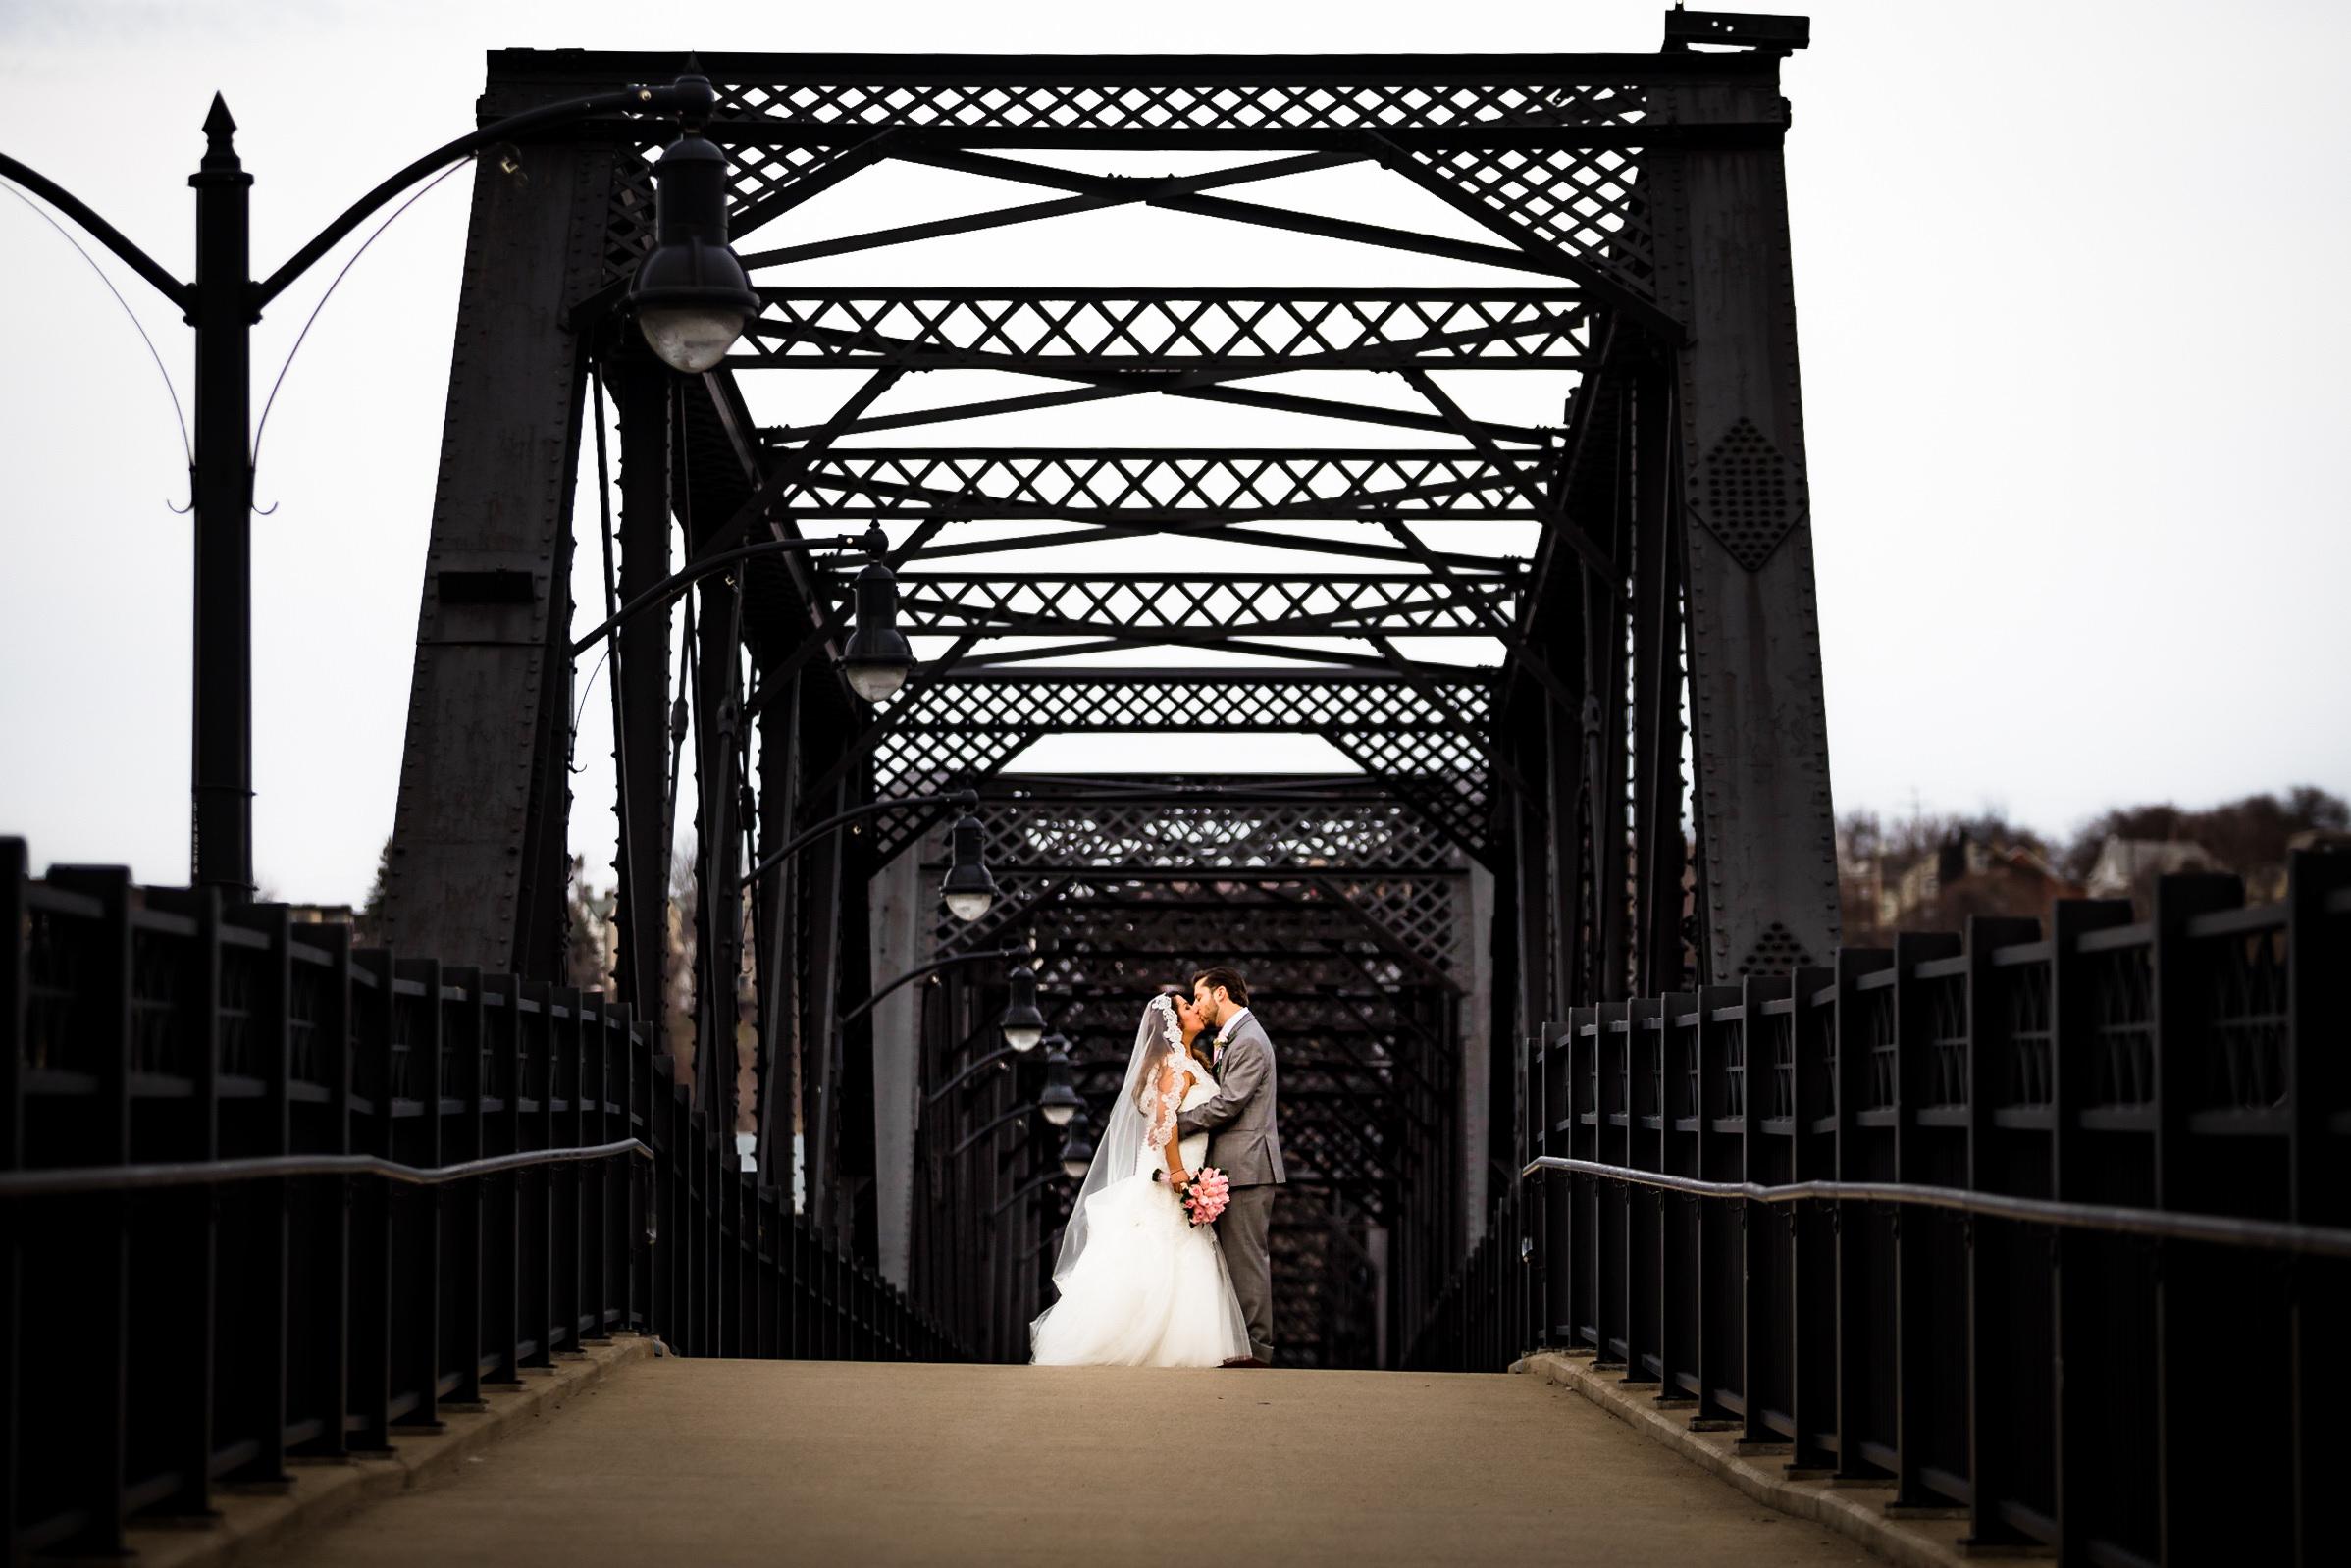 Southside Works Hot Metal Bridge Wedding Engagement Picture Locations-8.jpg